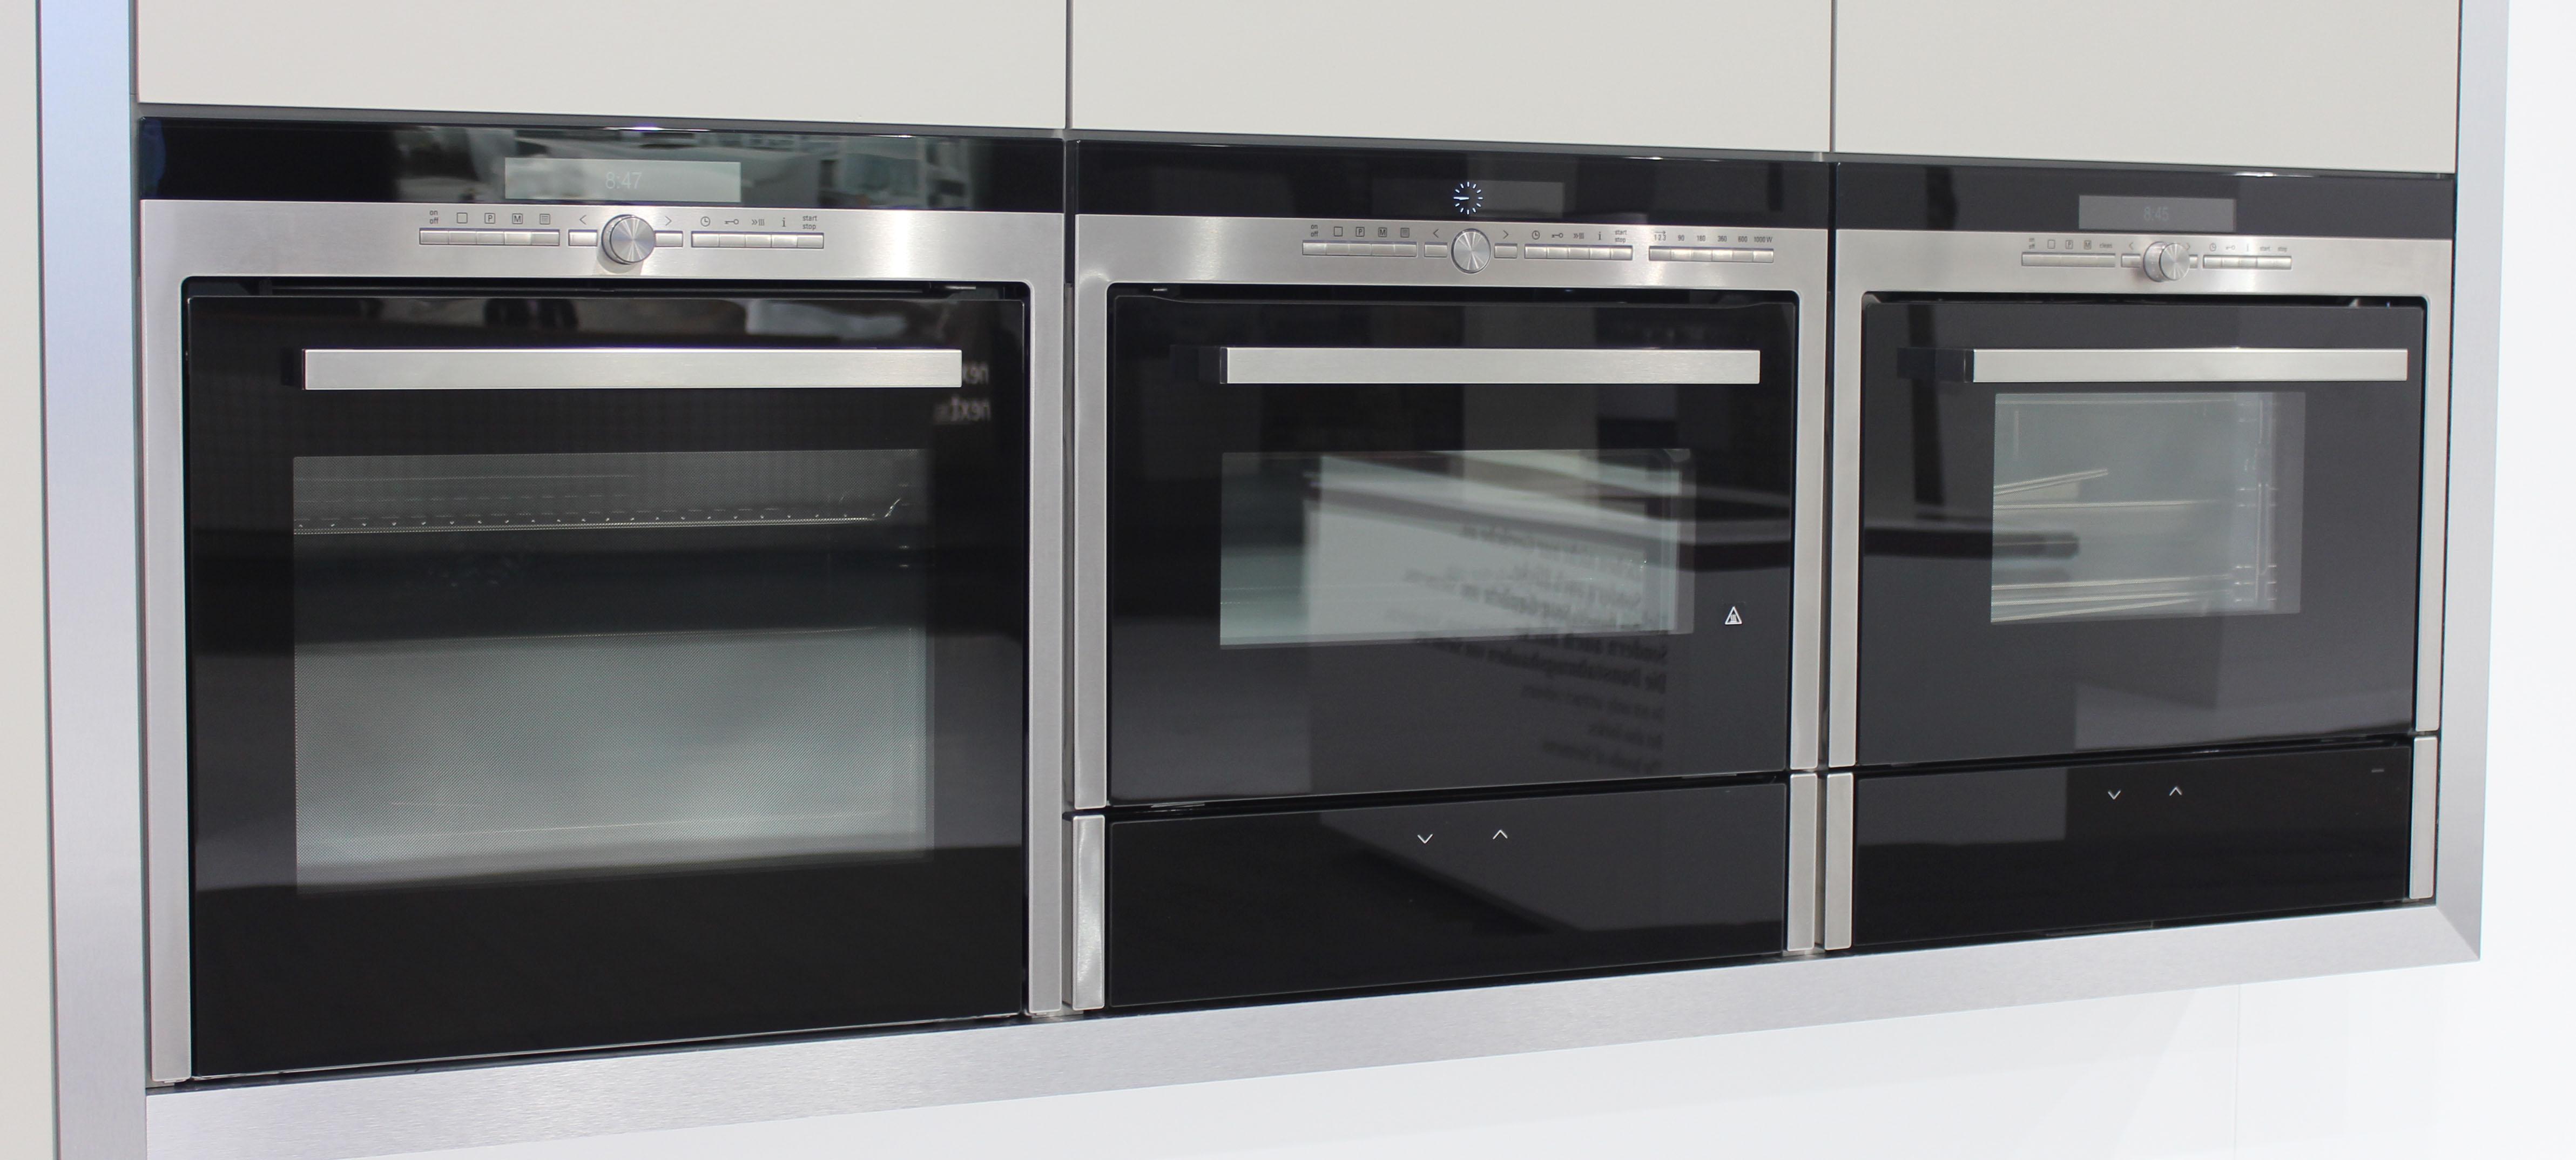 uncategorized siemens kitchen appliances wingsioskins. Black Bedroom Furniture Sets. Home Design Ideas